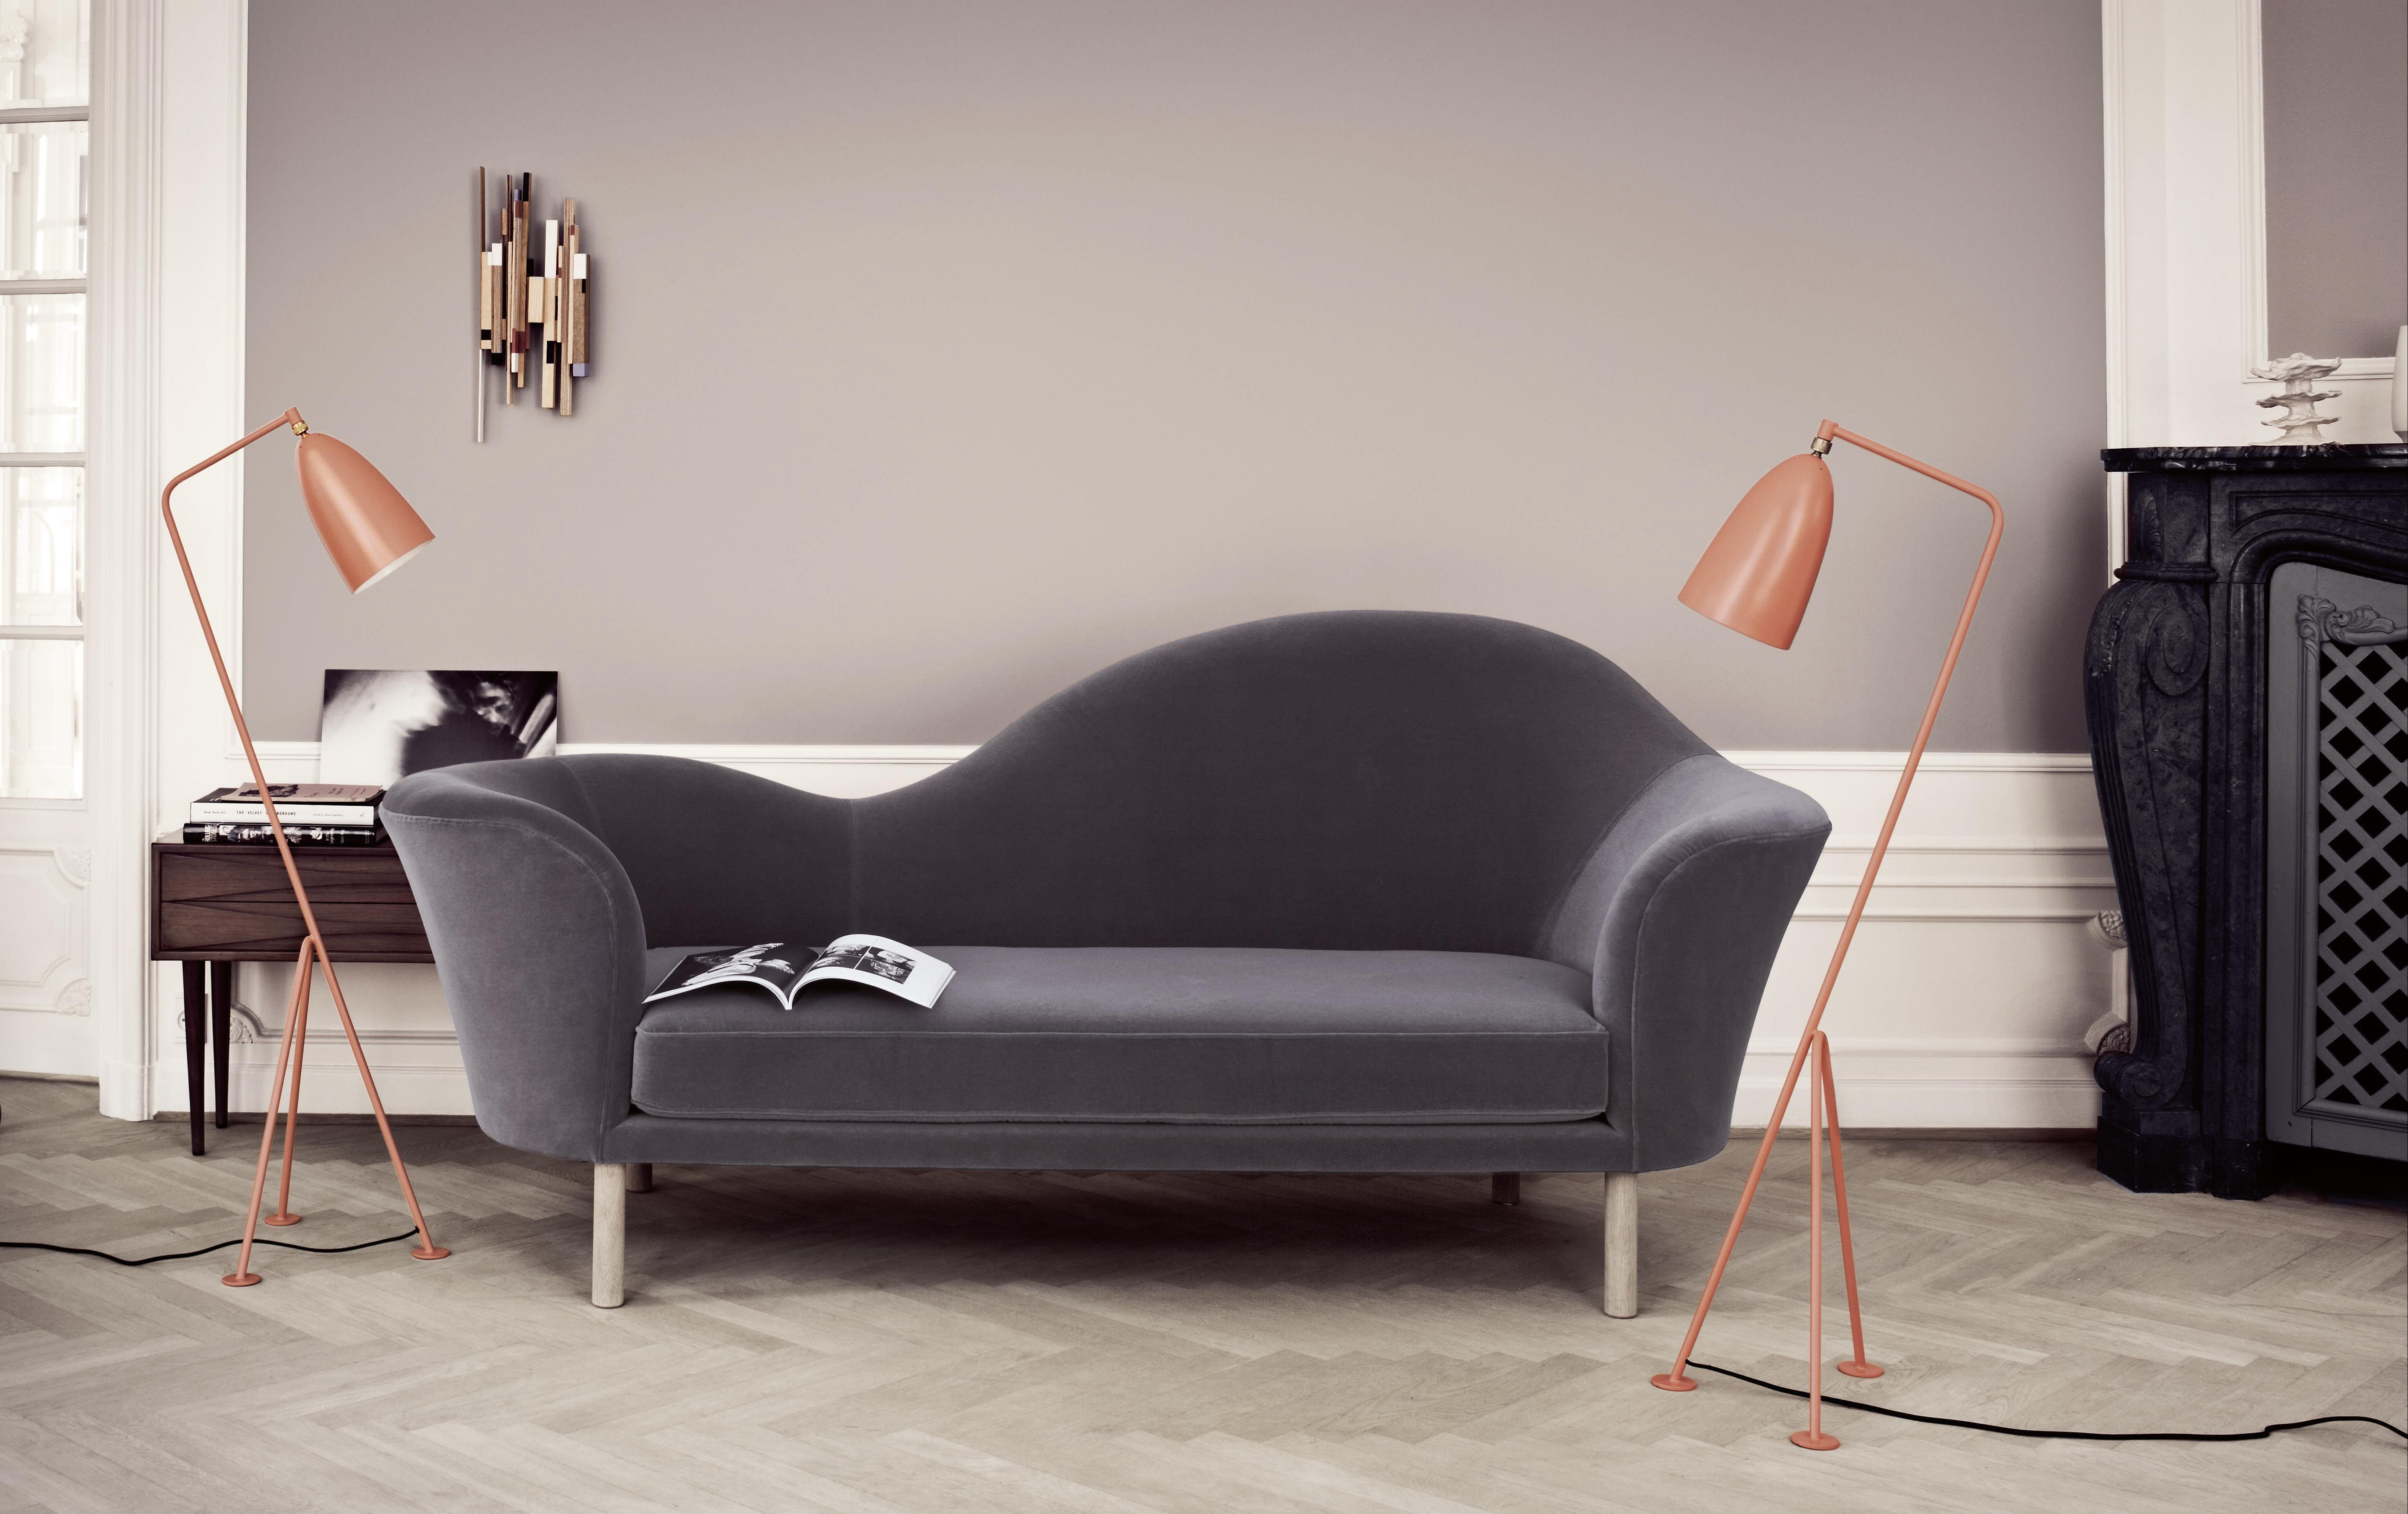 lampadaire grasshopper grossman r dition 1947 vieux. Black Bedroom Furniture Sets. Home Design Ideas